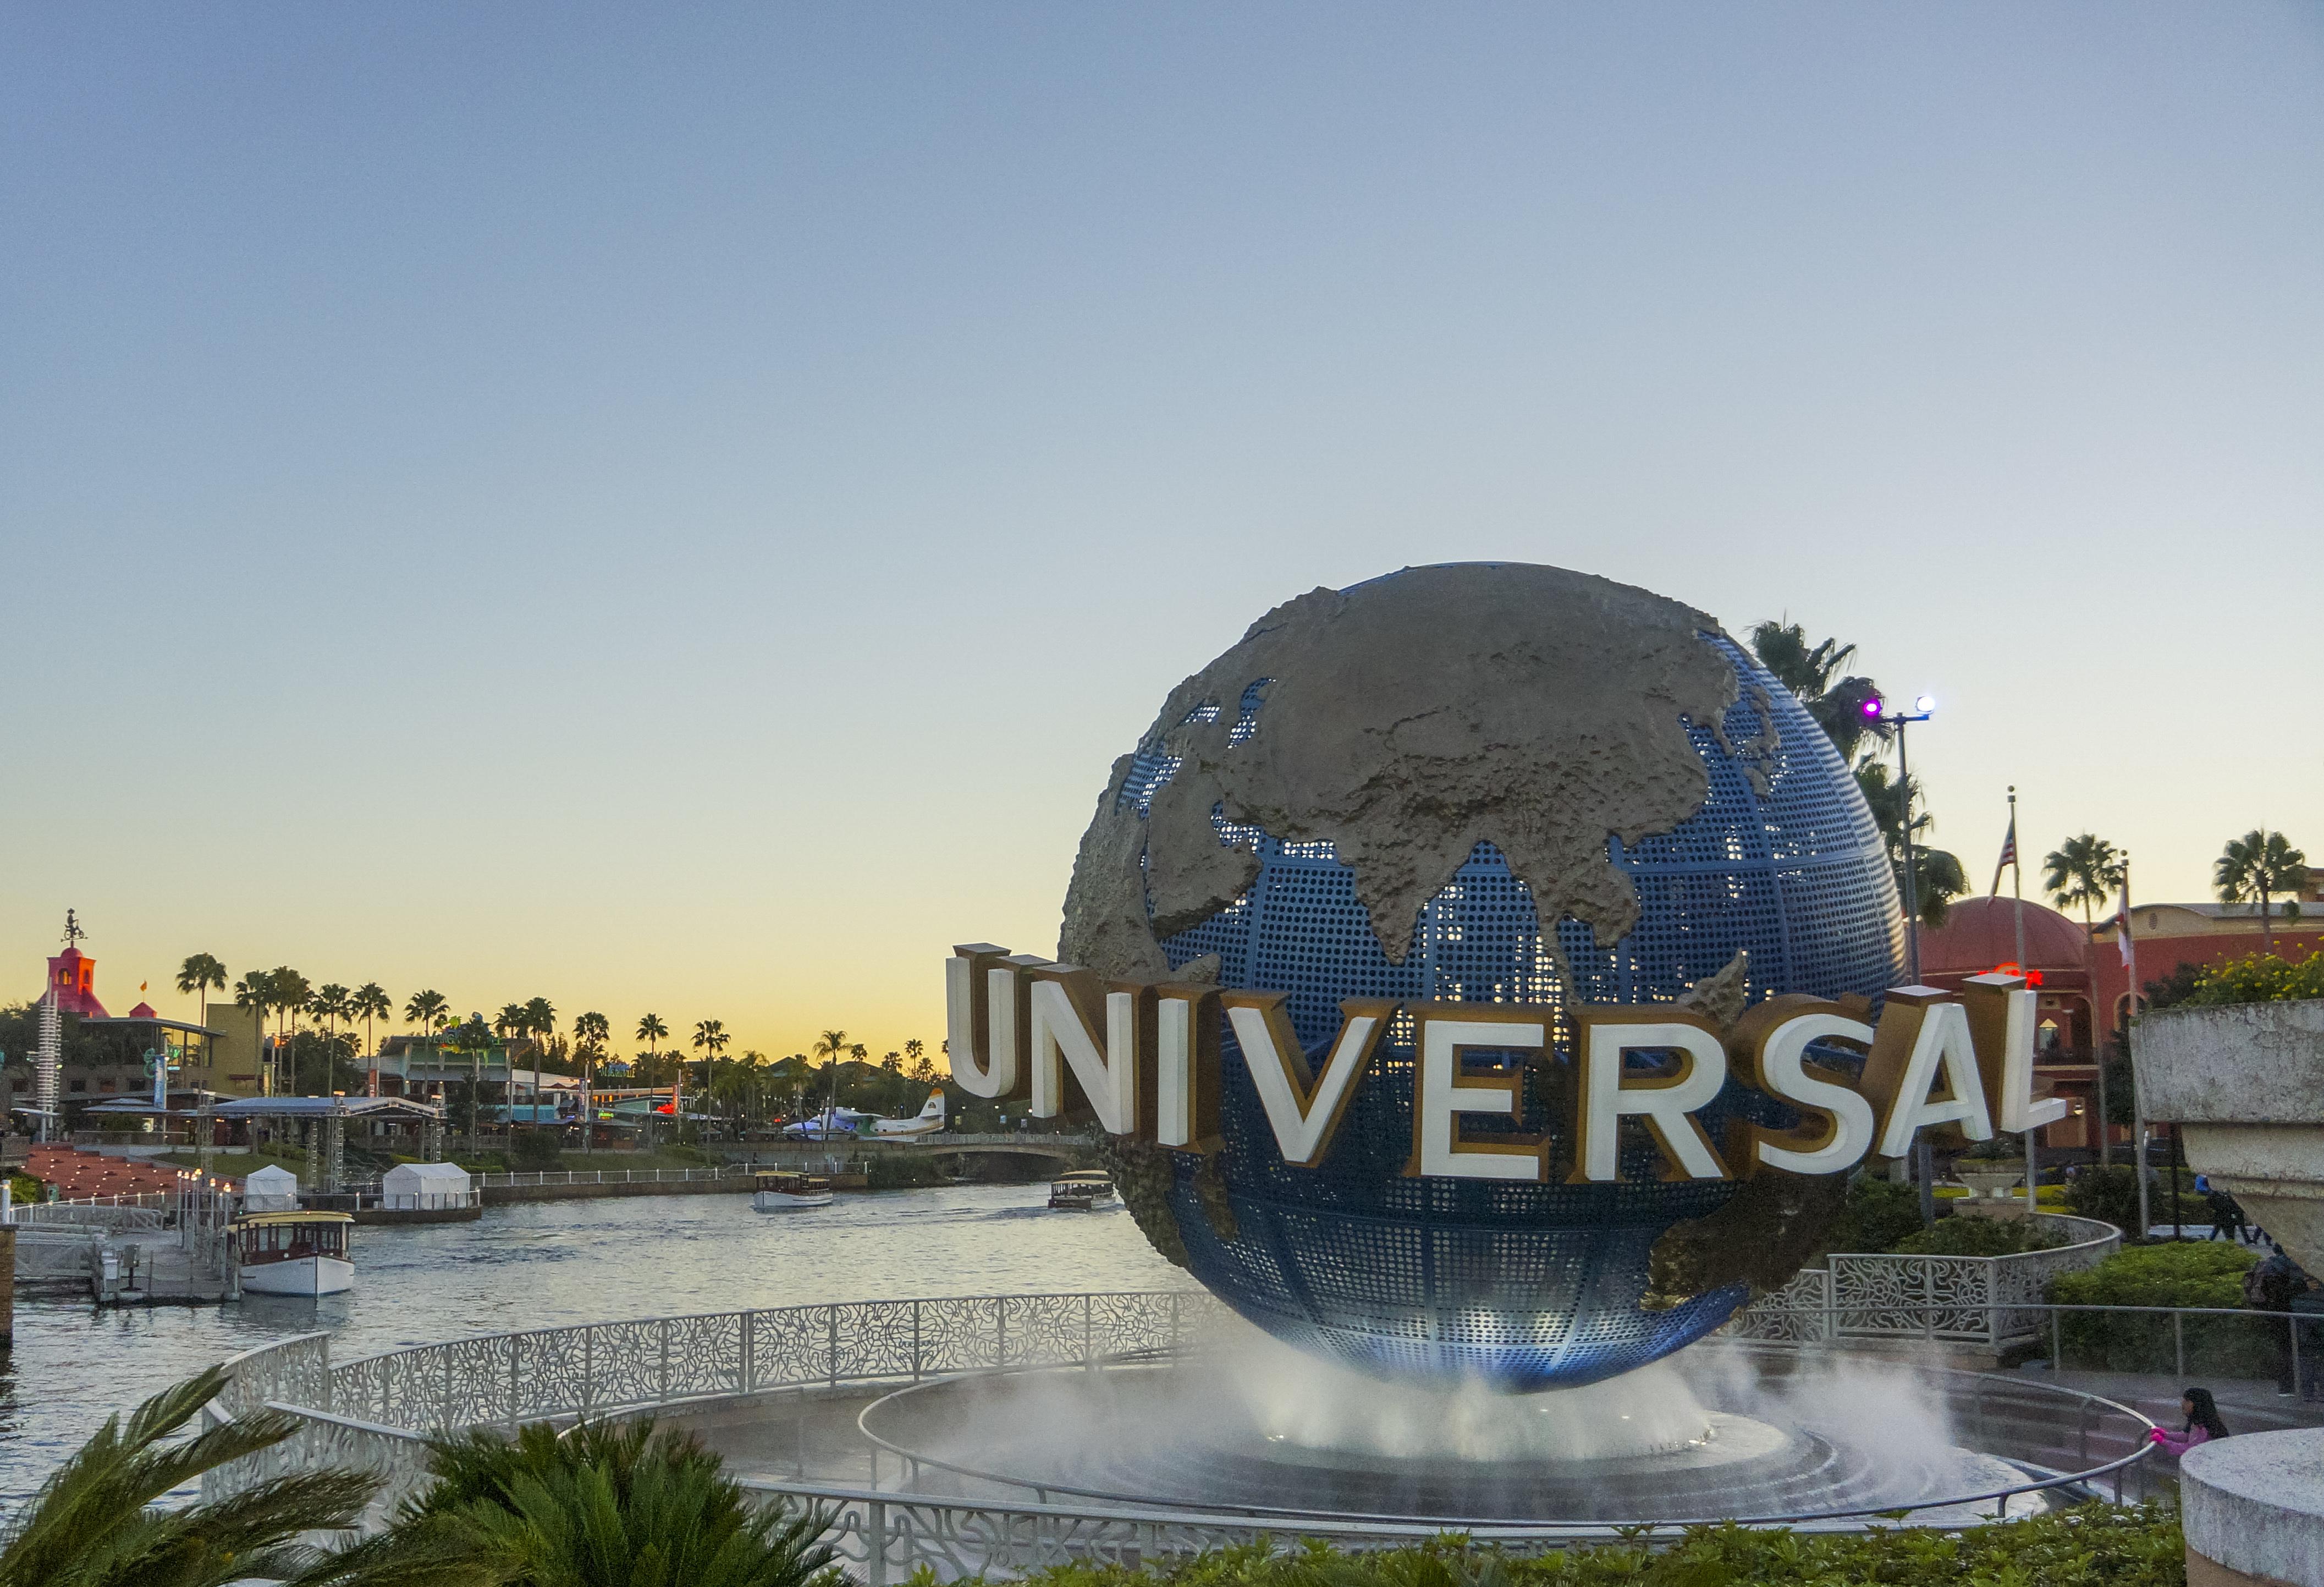 Entrada do Universal Studios